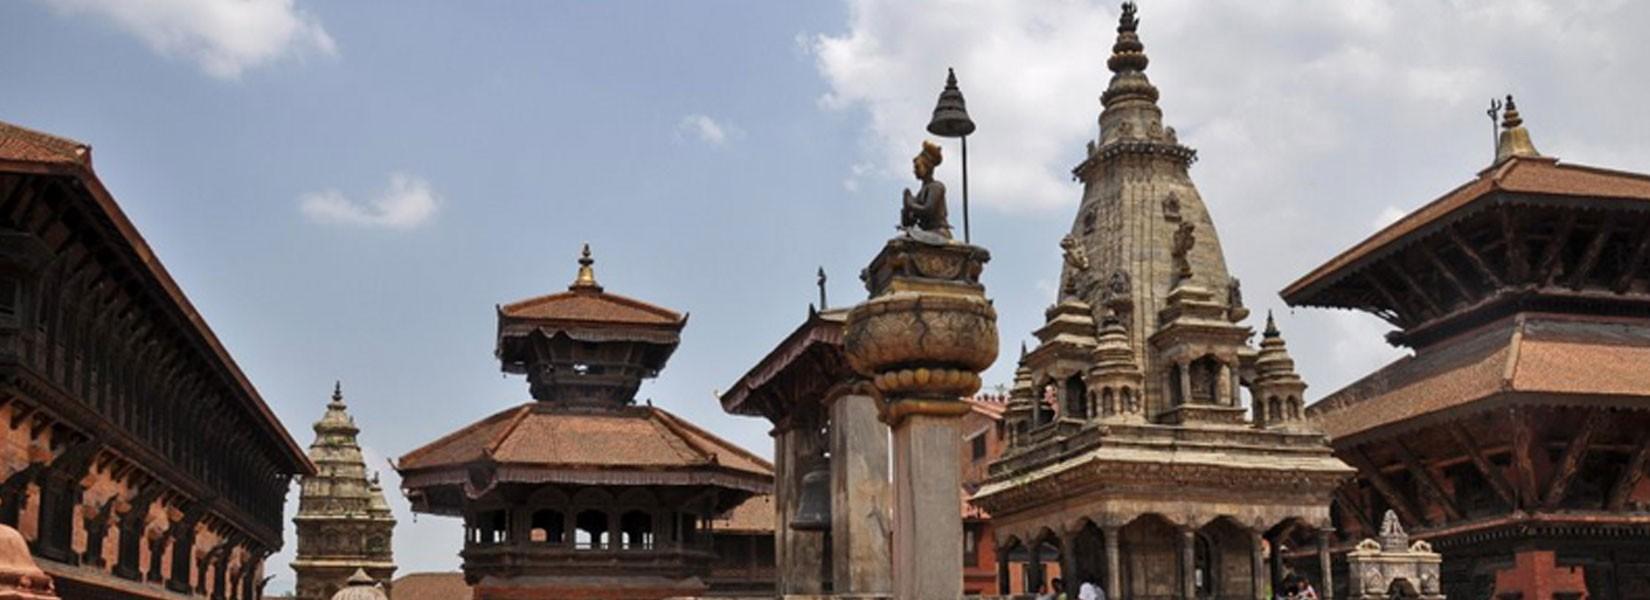 Bhaktapur Durbar Square Day Trip